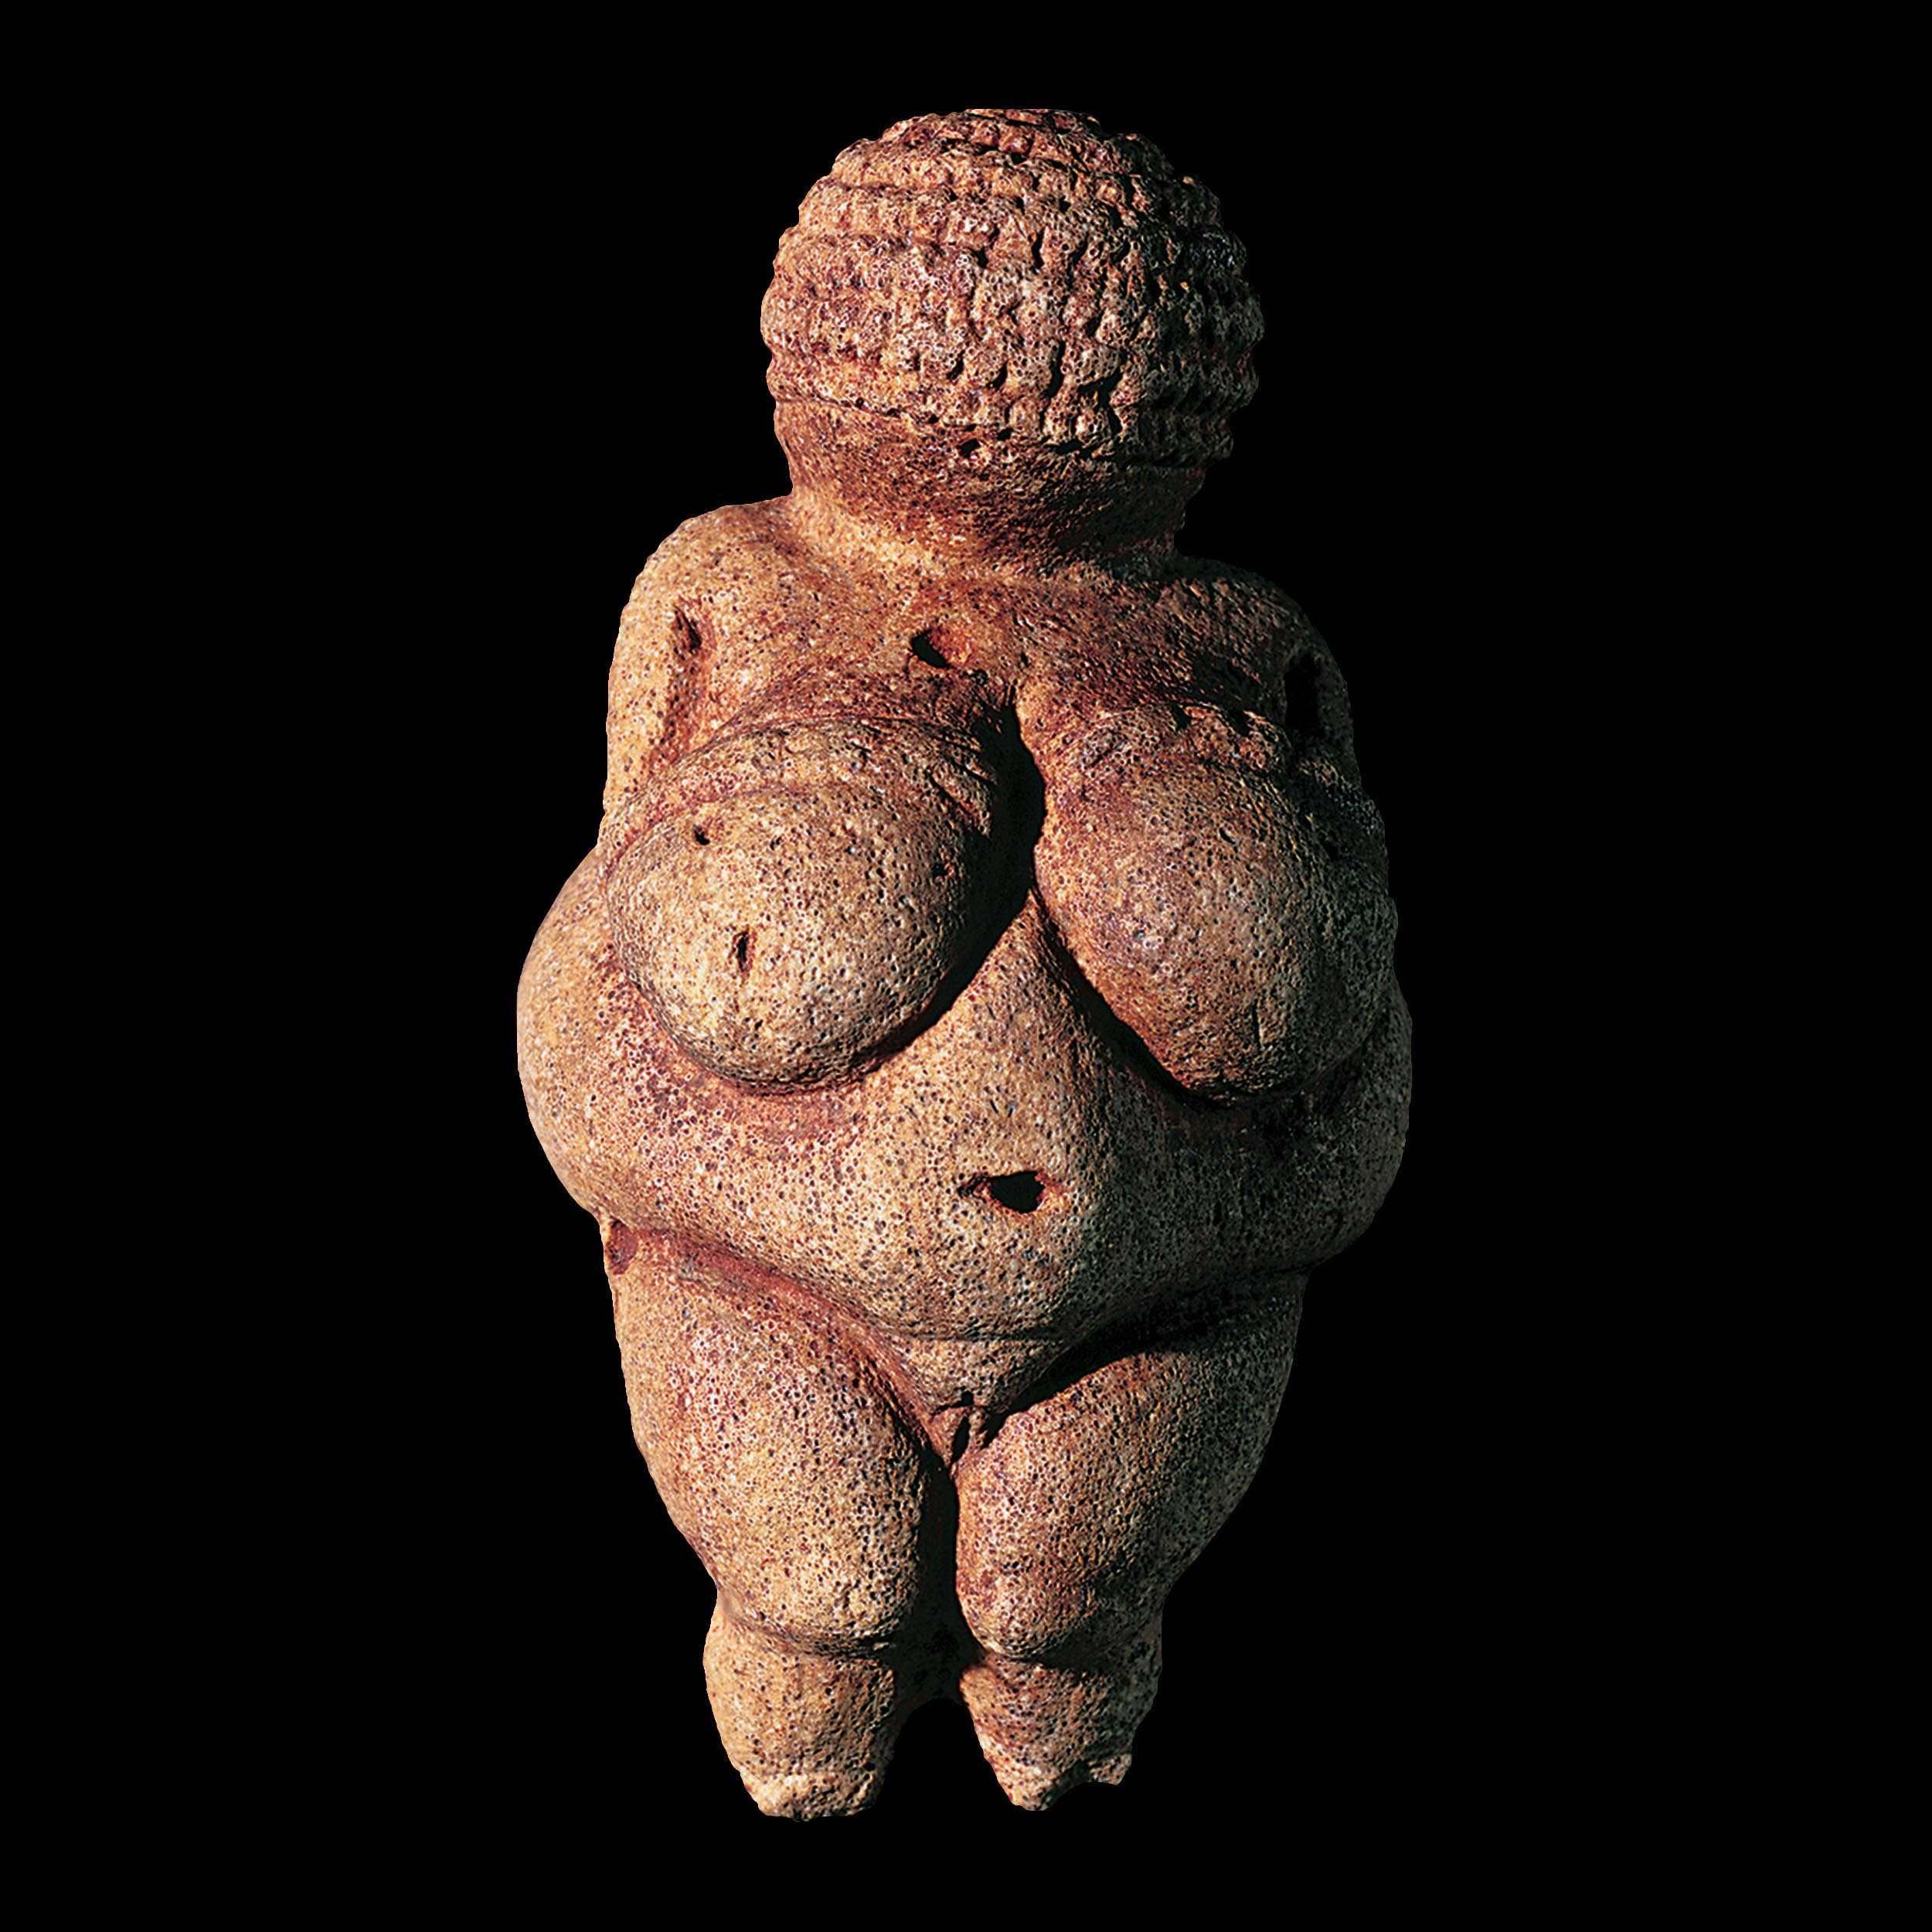 Venus of Willendorf, picture of statue, prehistoric art sculpture, Cave painting, history, prehistoric, france, spain, caves, ancient, animal, sacrifice, religion, primitive, les trois-freres, lascaux - HeadStuff.org